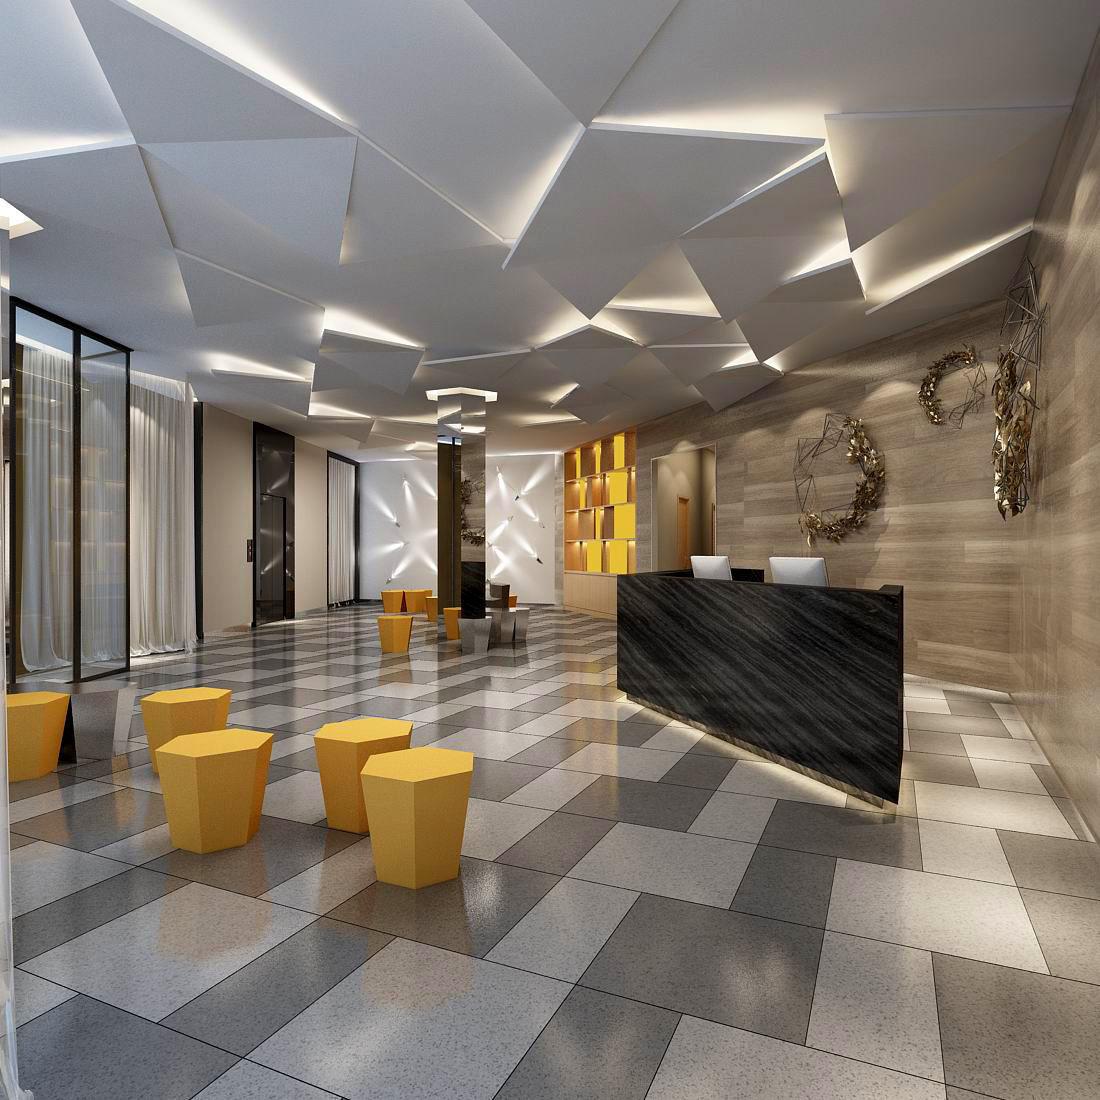 d model office meeting room reception hall   cgtrader. office meeting room reception hall  d model max